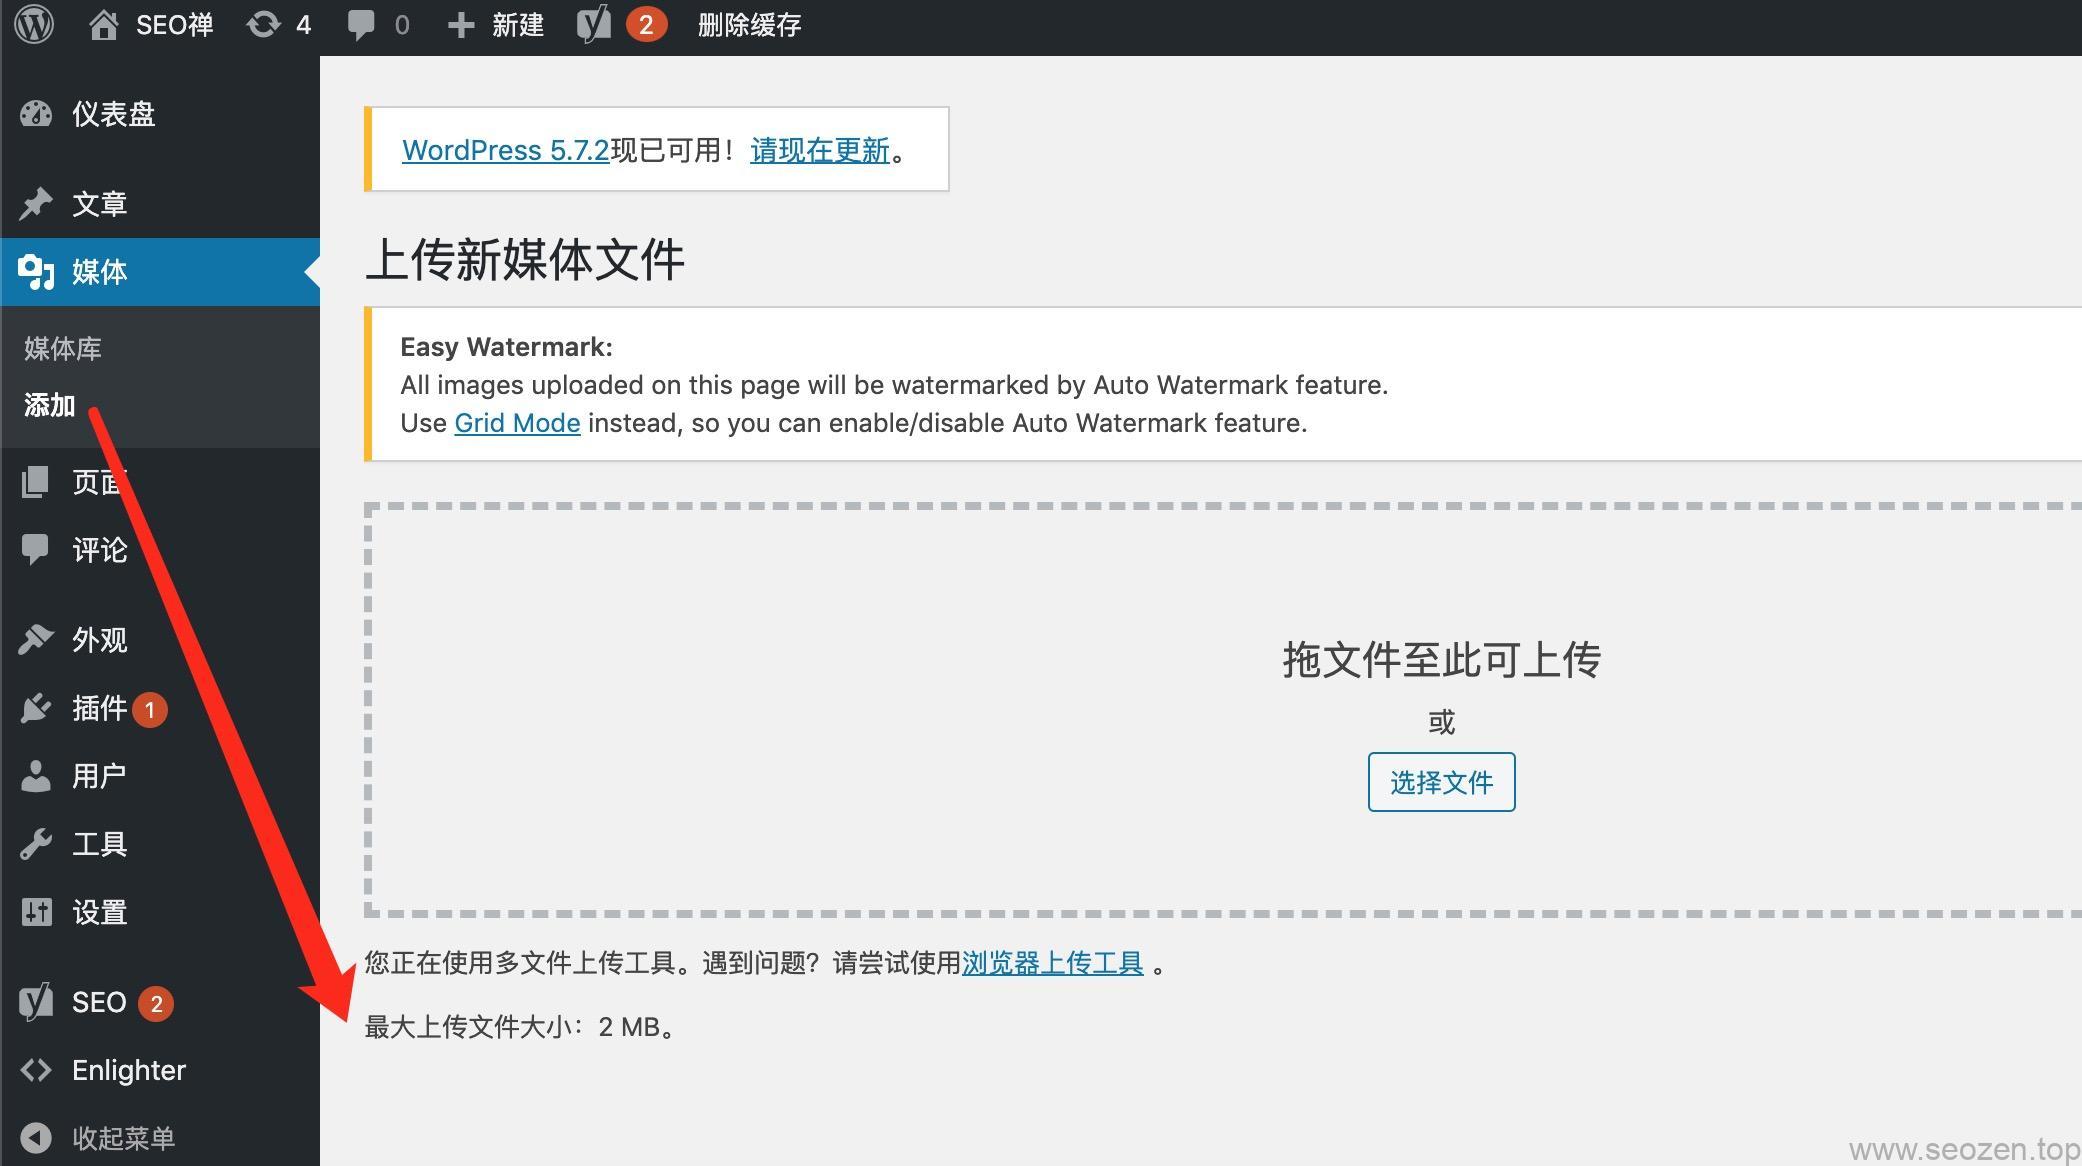 seozen-max-upload-file-size